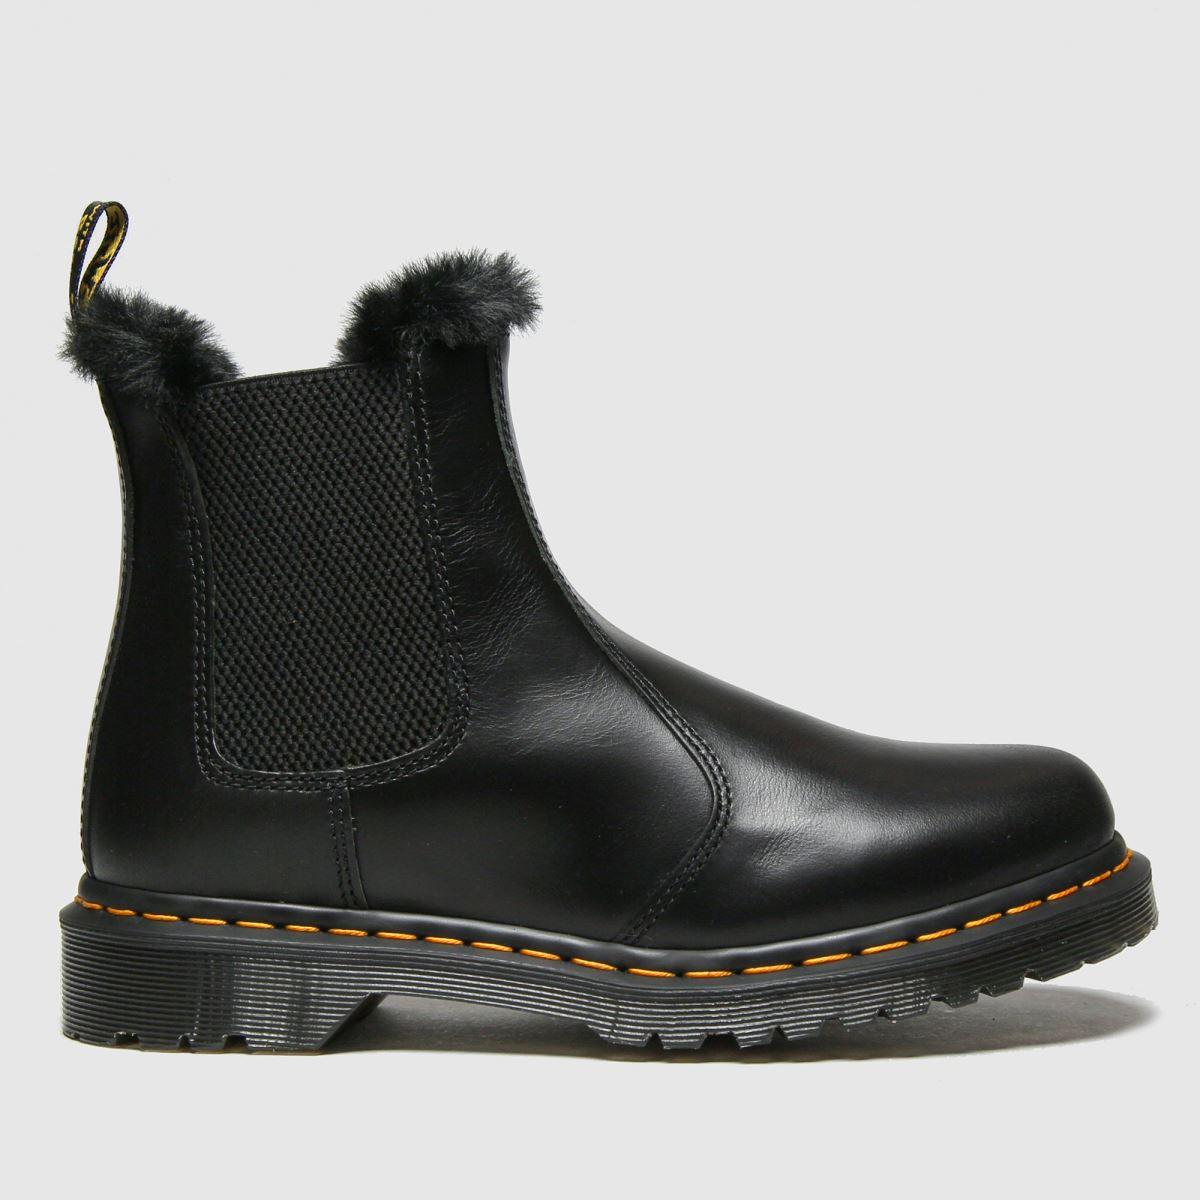 Dr Martens Black Leonore Fur-lined Chelsea Boots